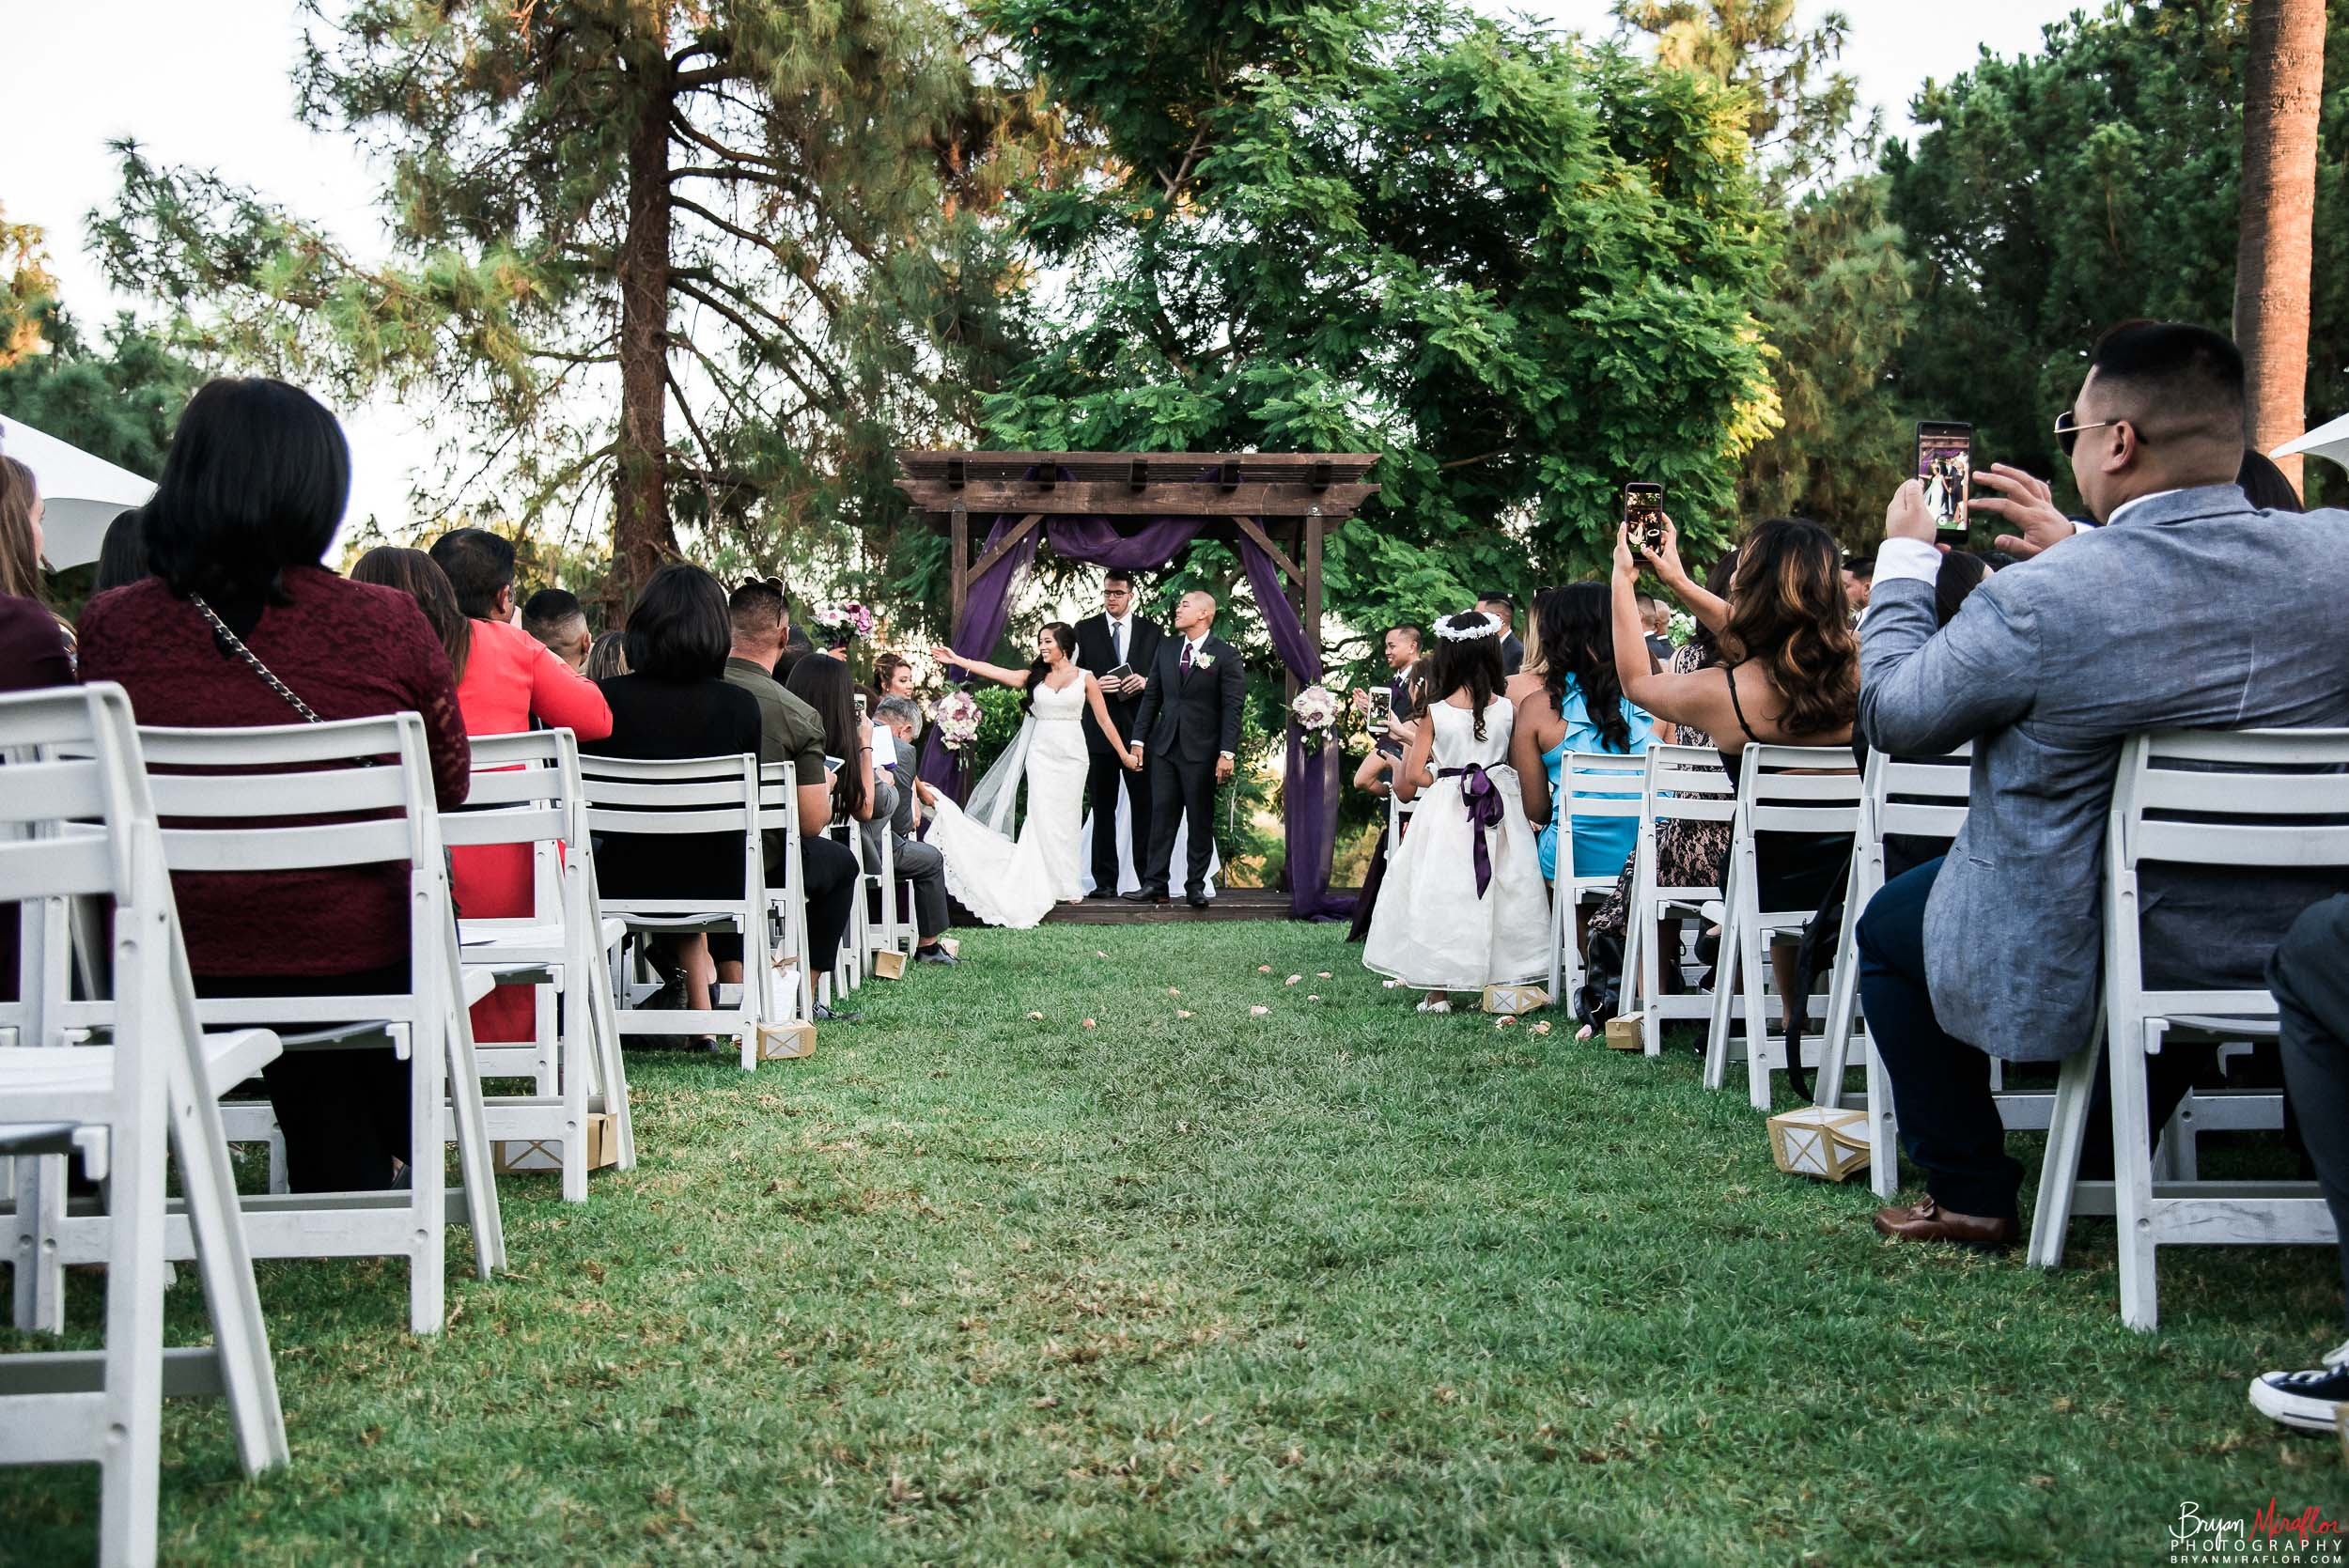 Bryan-Miraflor-Photography-Trisha-Dexter-Married-20170923-059.jpg